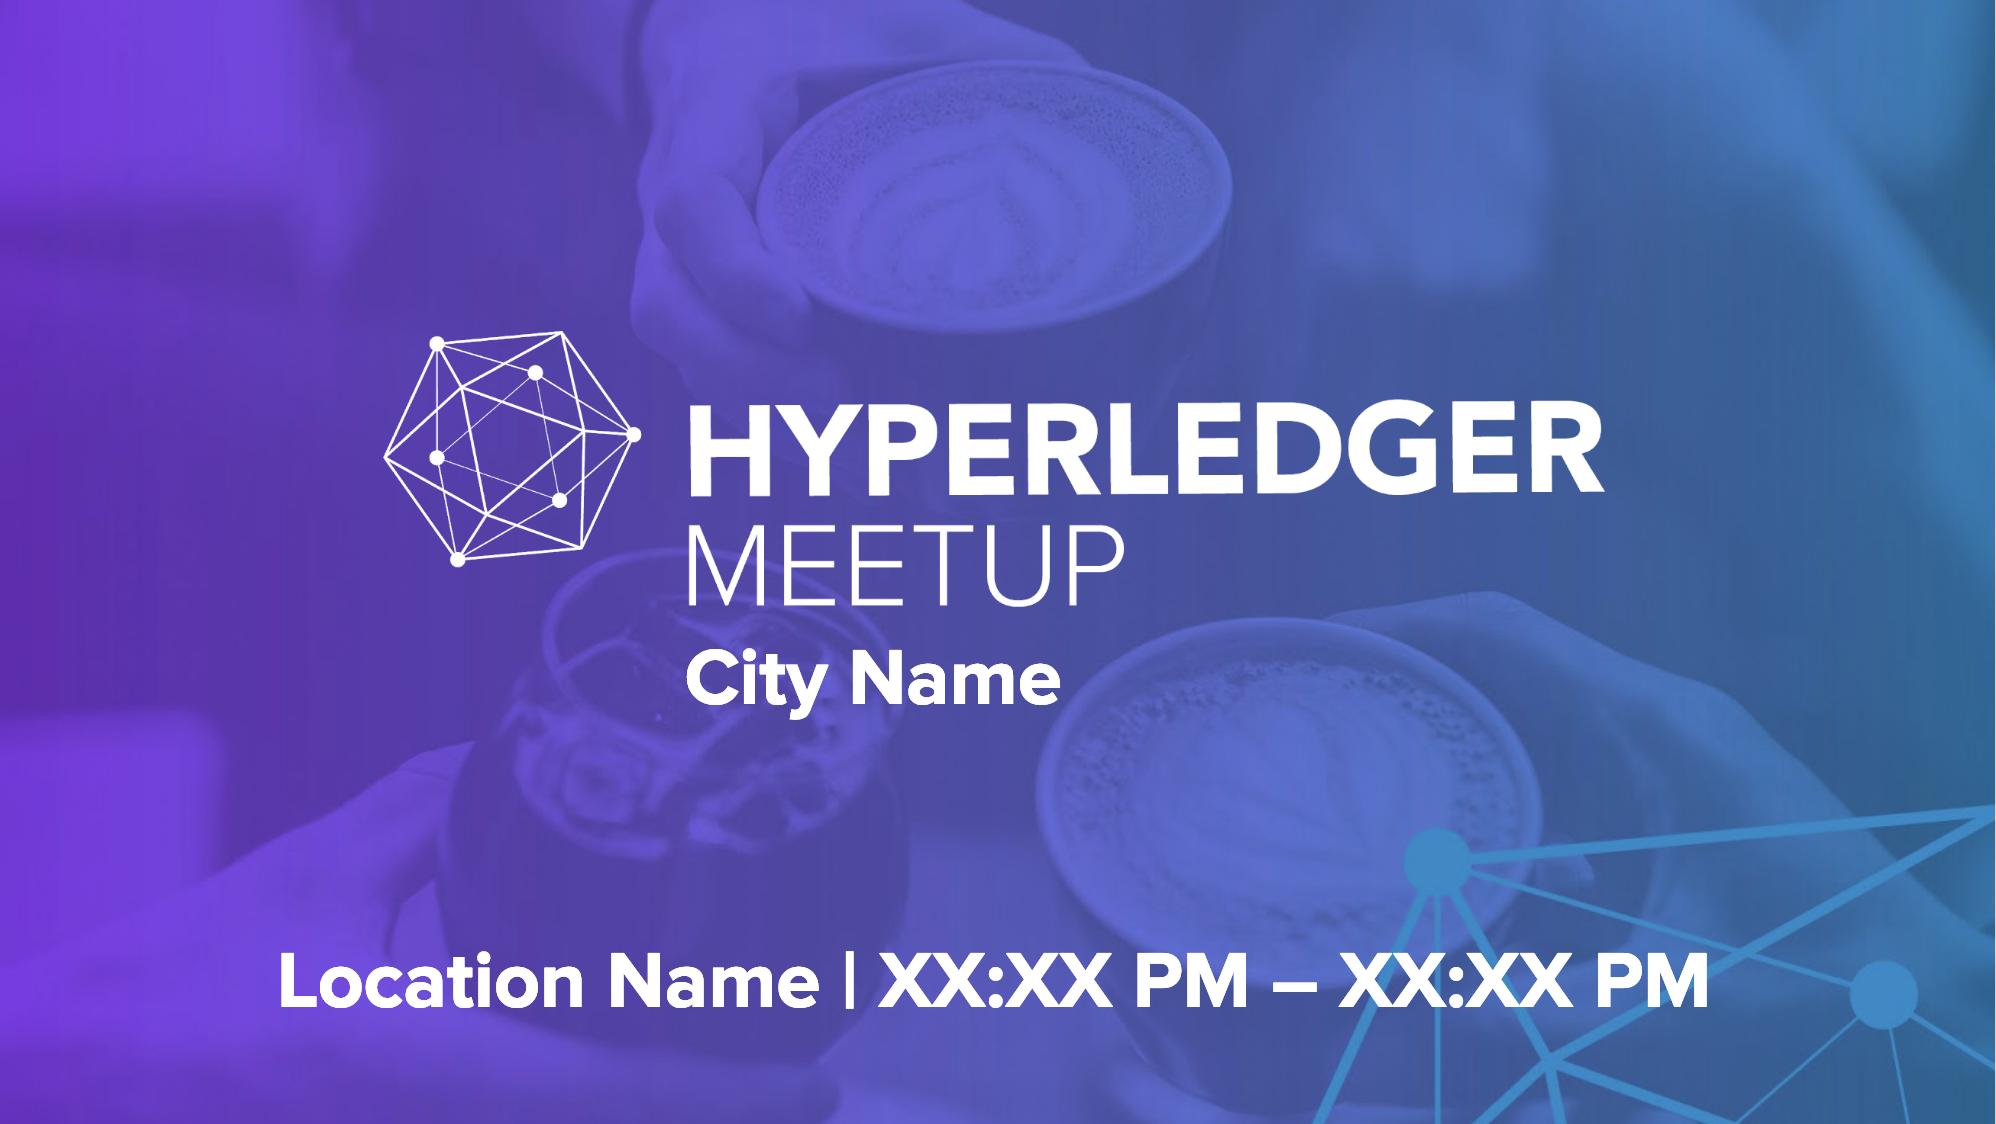 Meetup Organizer's Guide - Community Events - Hyperledger